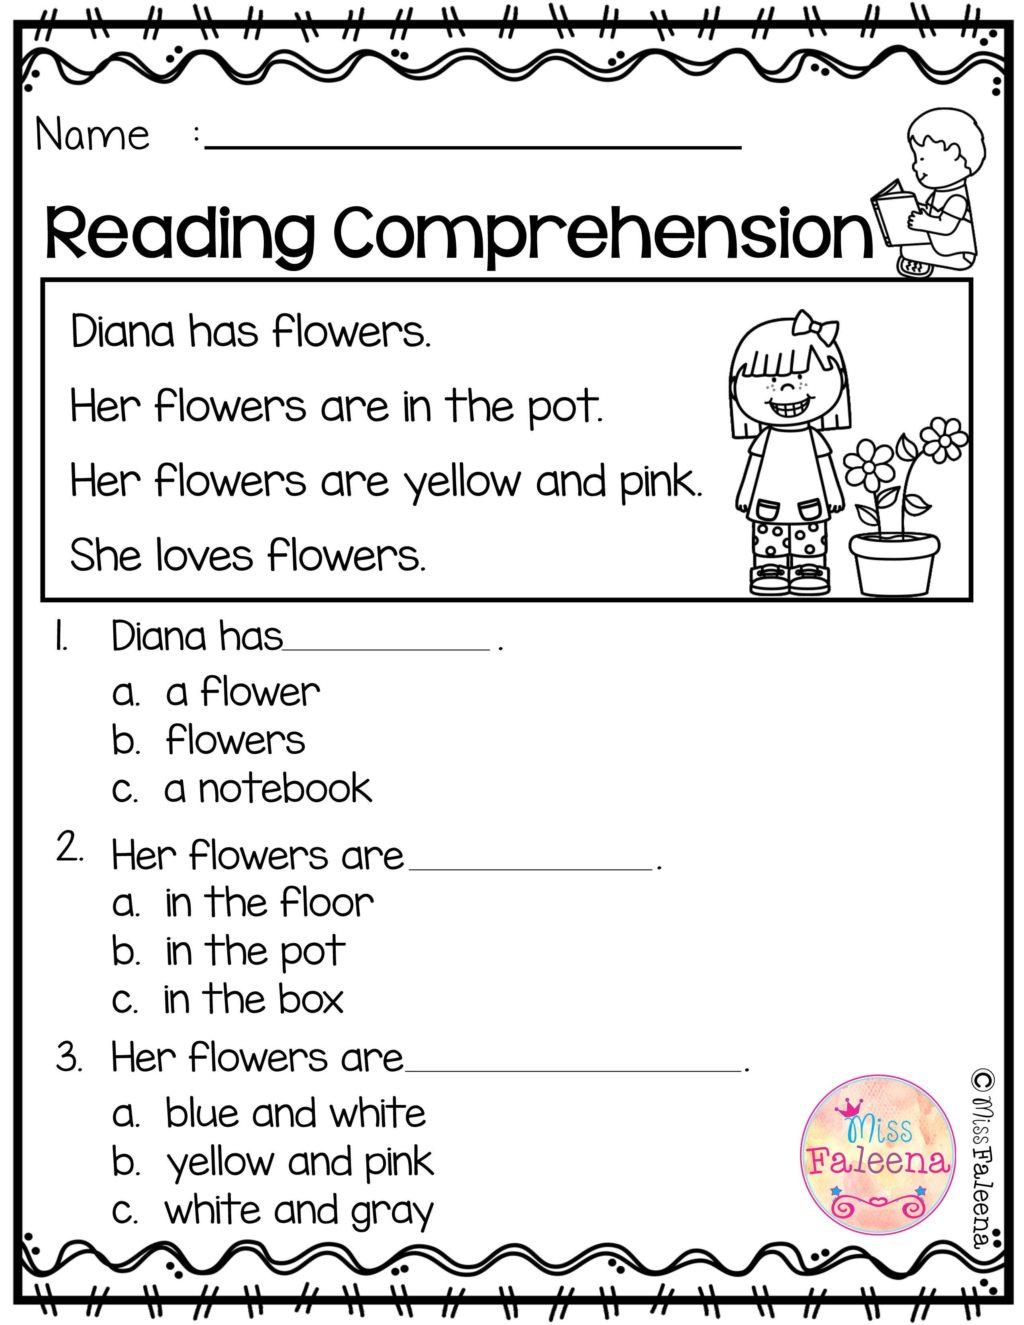 Worksheet ~ Free Reading Comprehension Worksheet